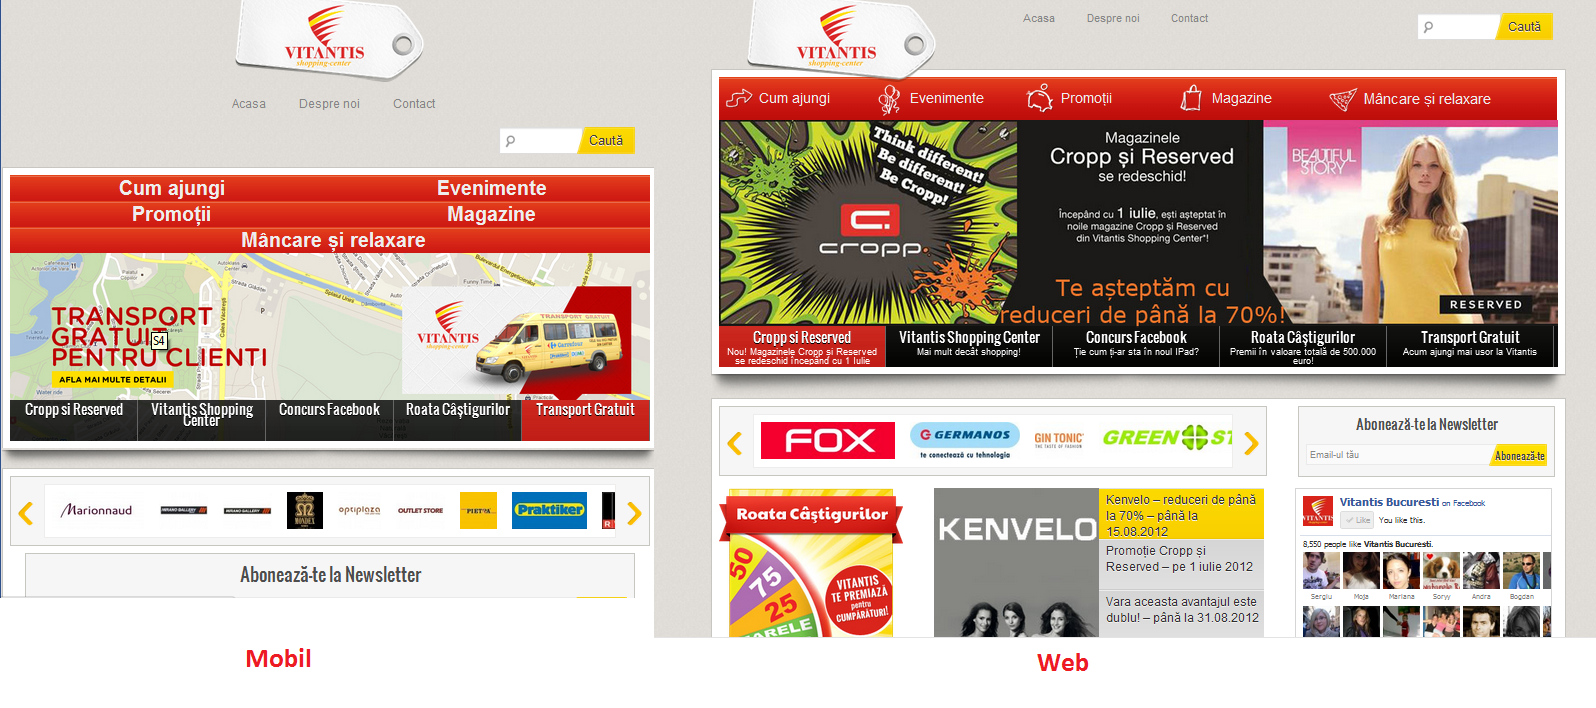 responsive-web-vitantis